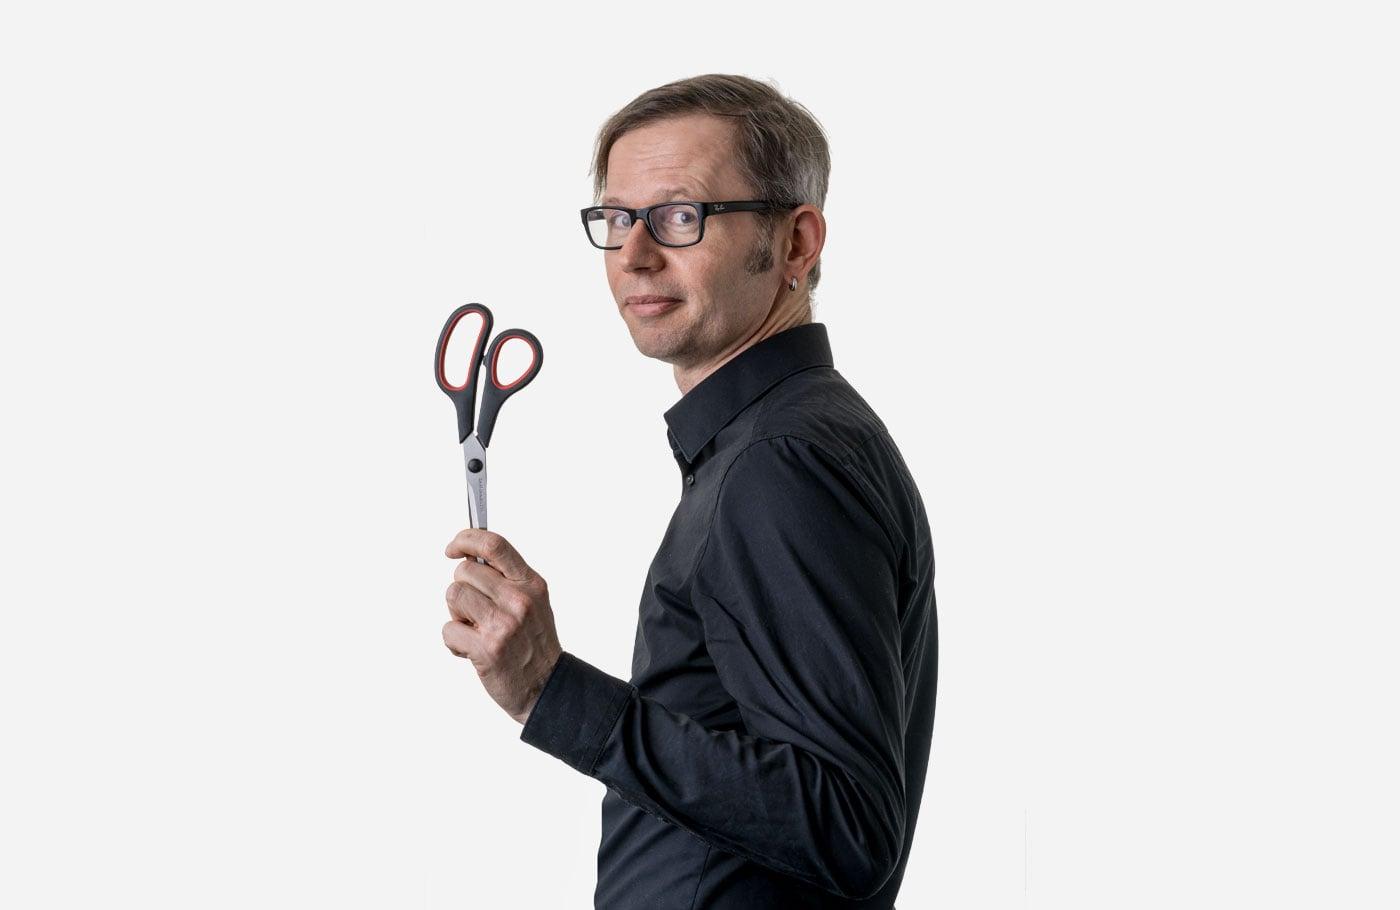 Christian Terbeck